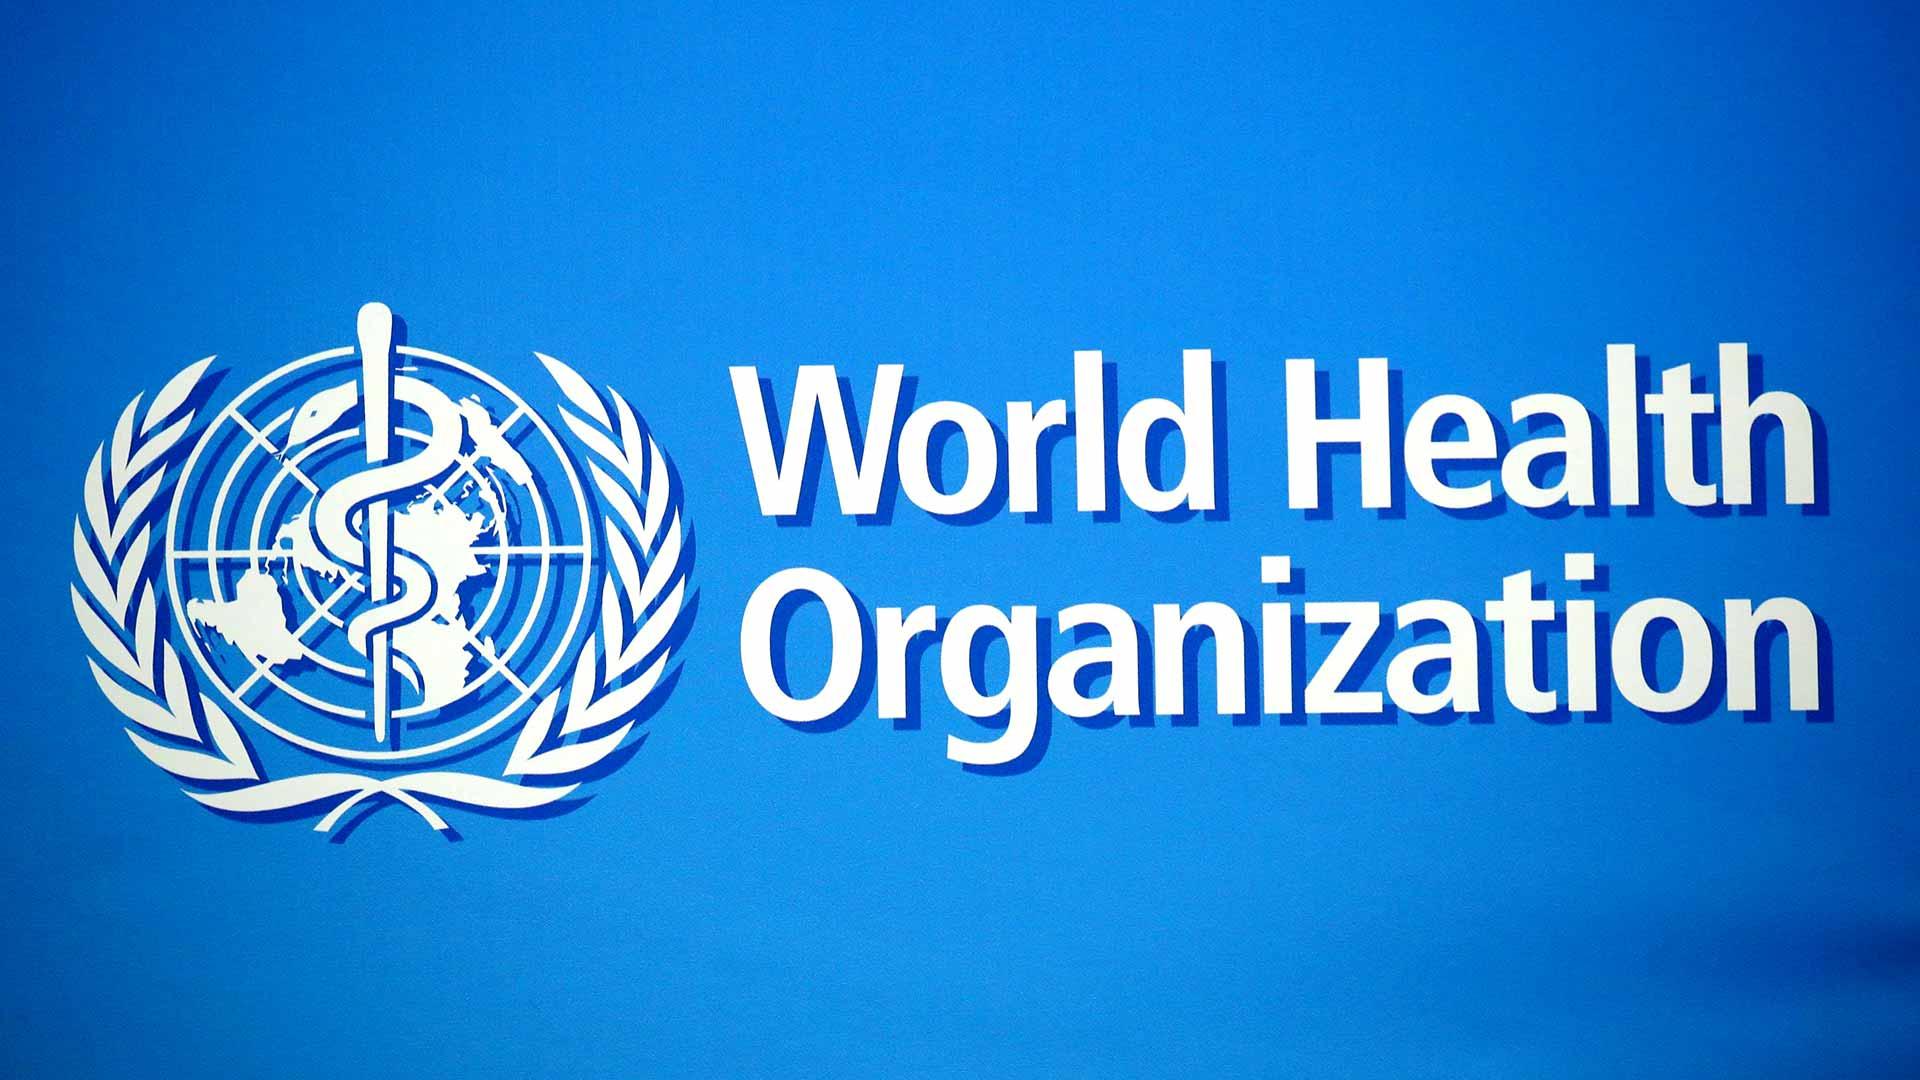 World Health Organization - WHO